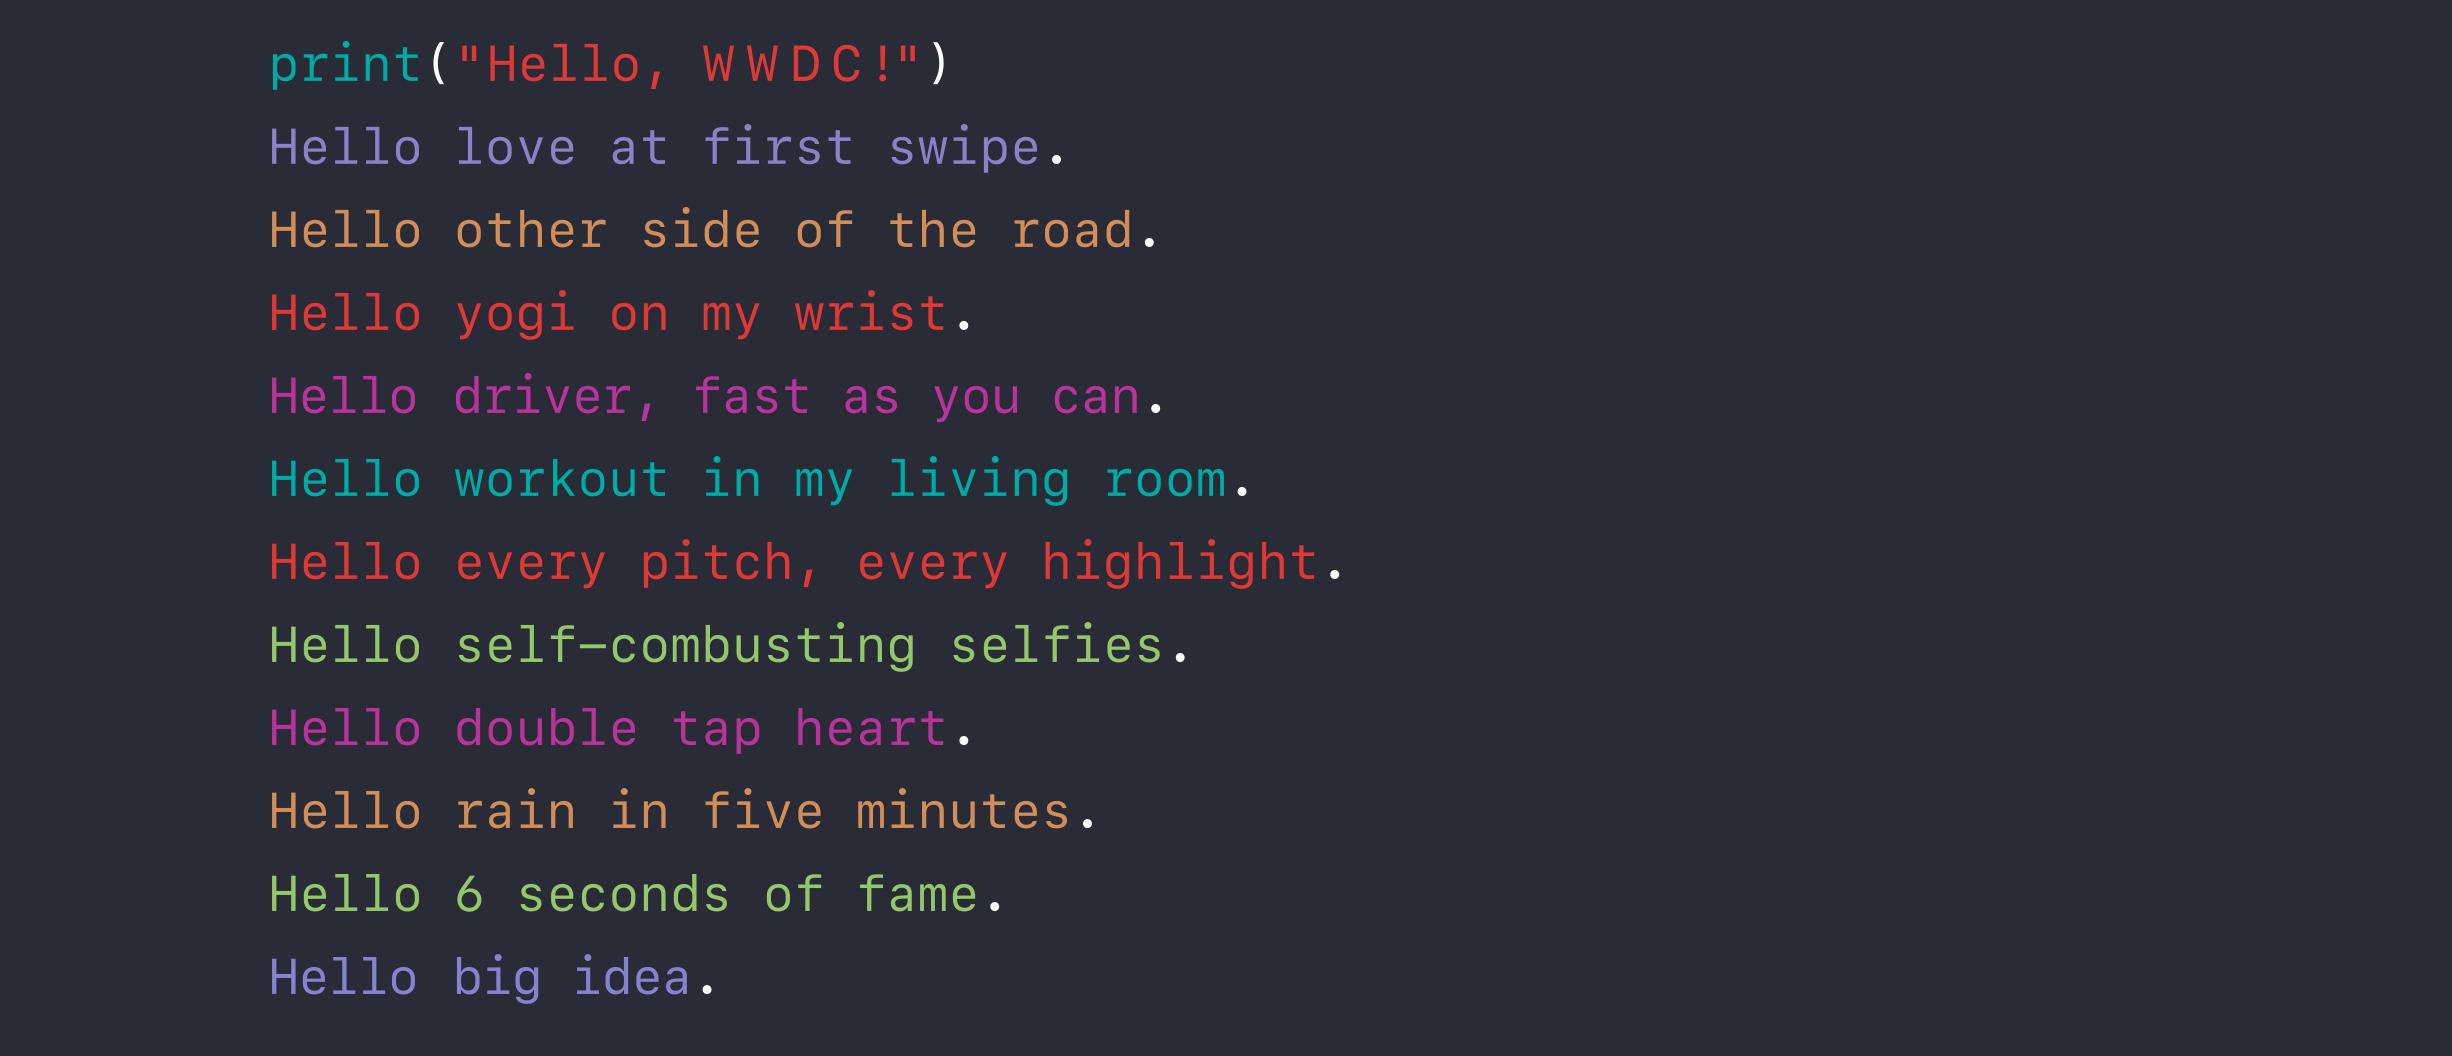 Yep, Apple's WWDC 2016 Definitely Starts on June 13th